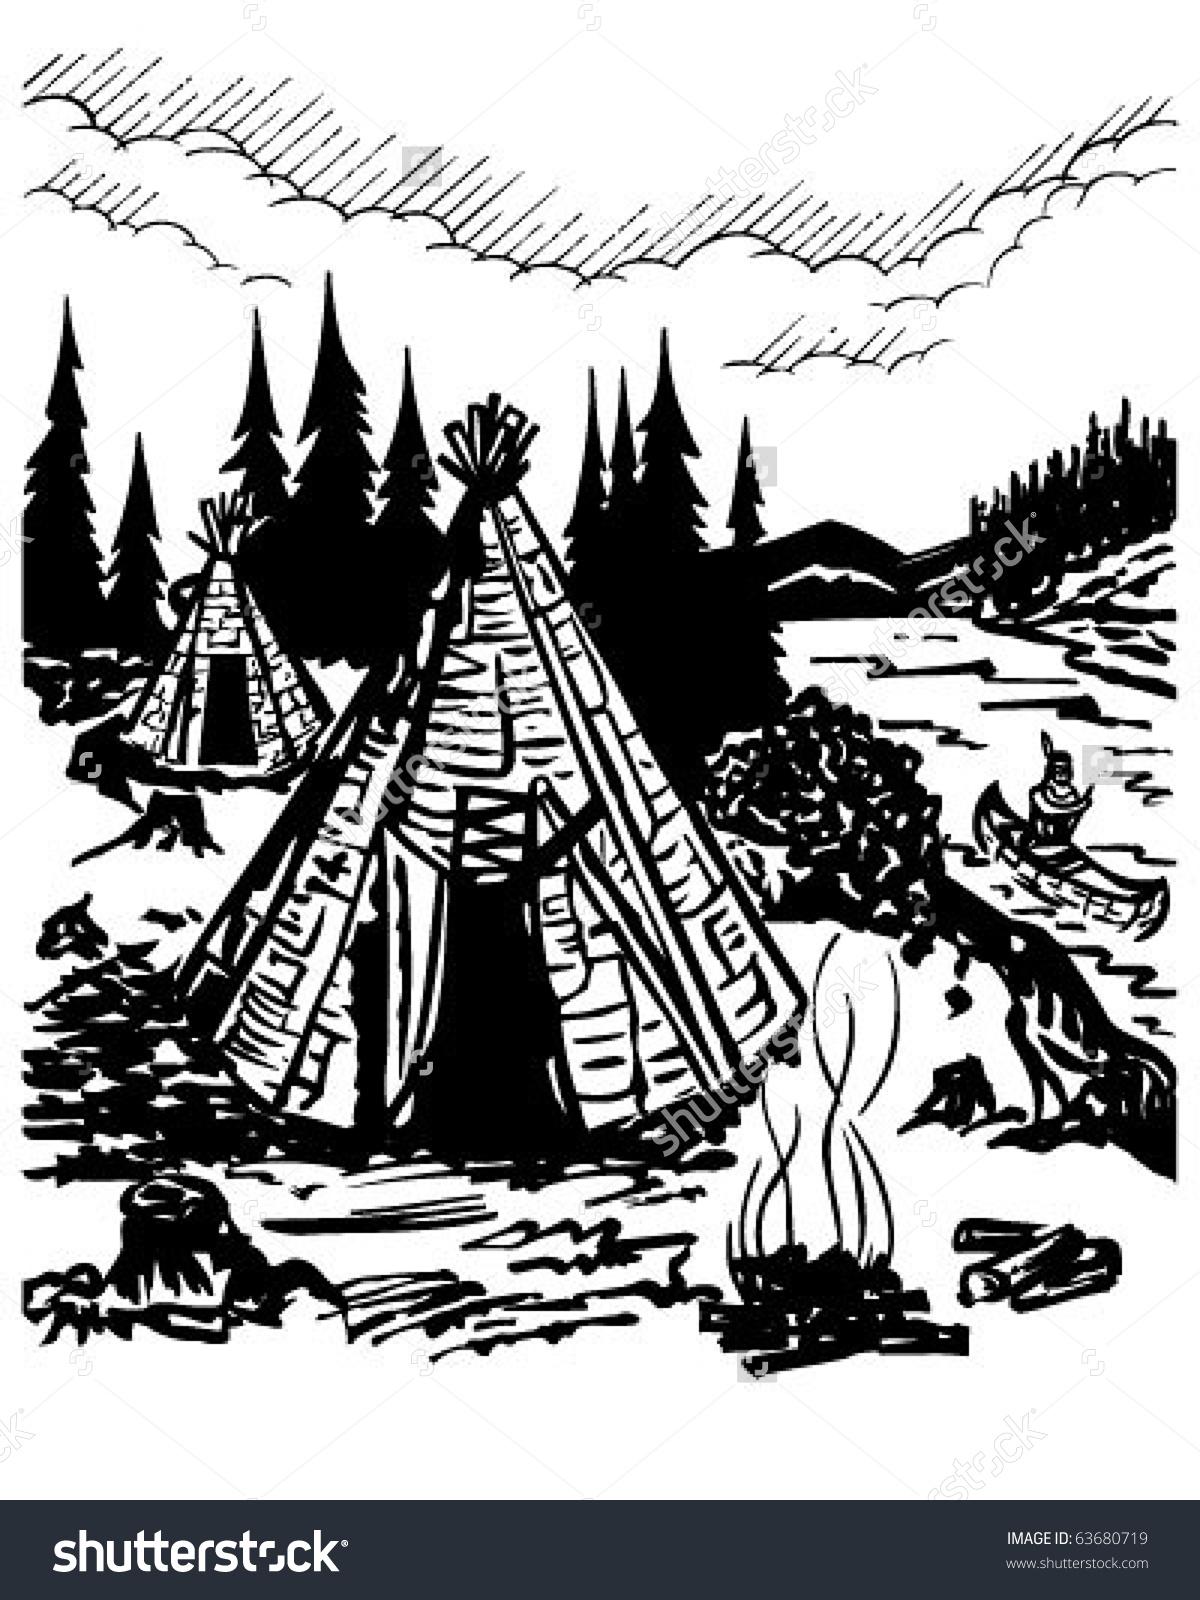 Indian Village Retro Clipart Illustration Stock Vector 63680719.